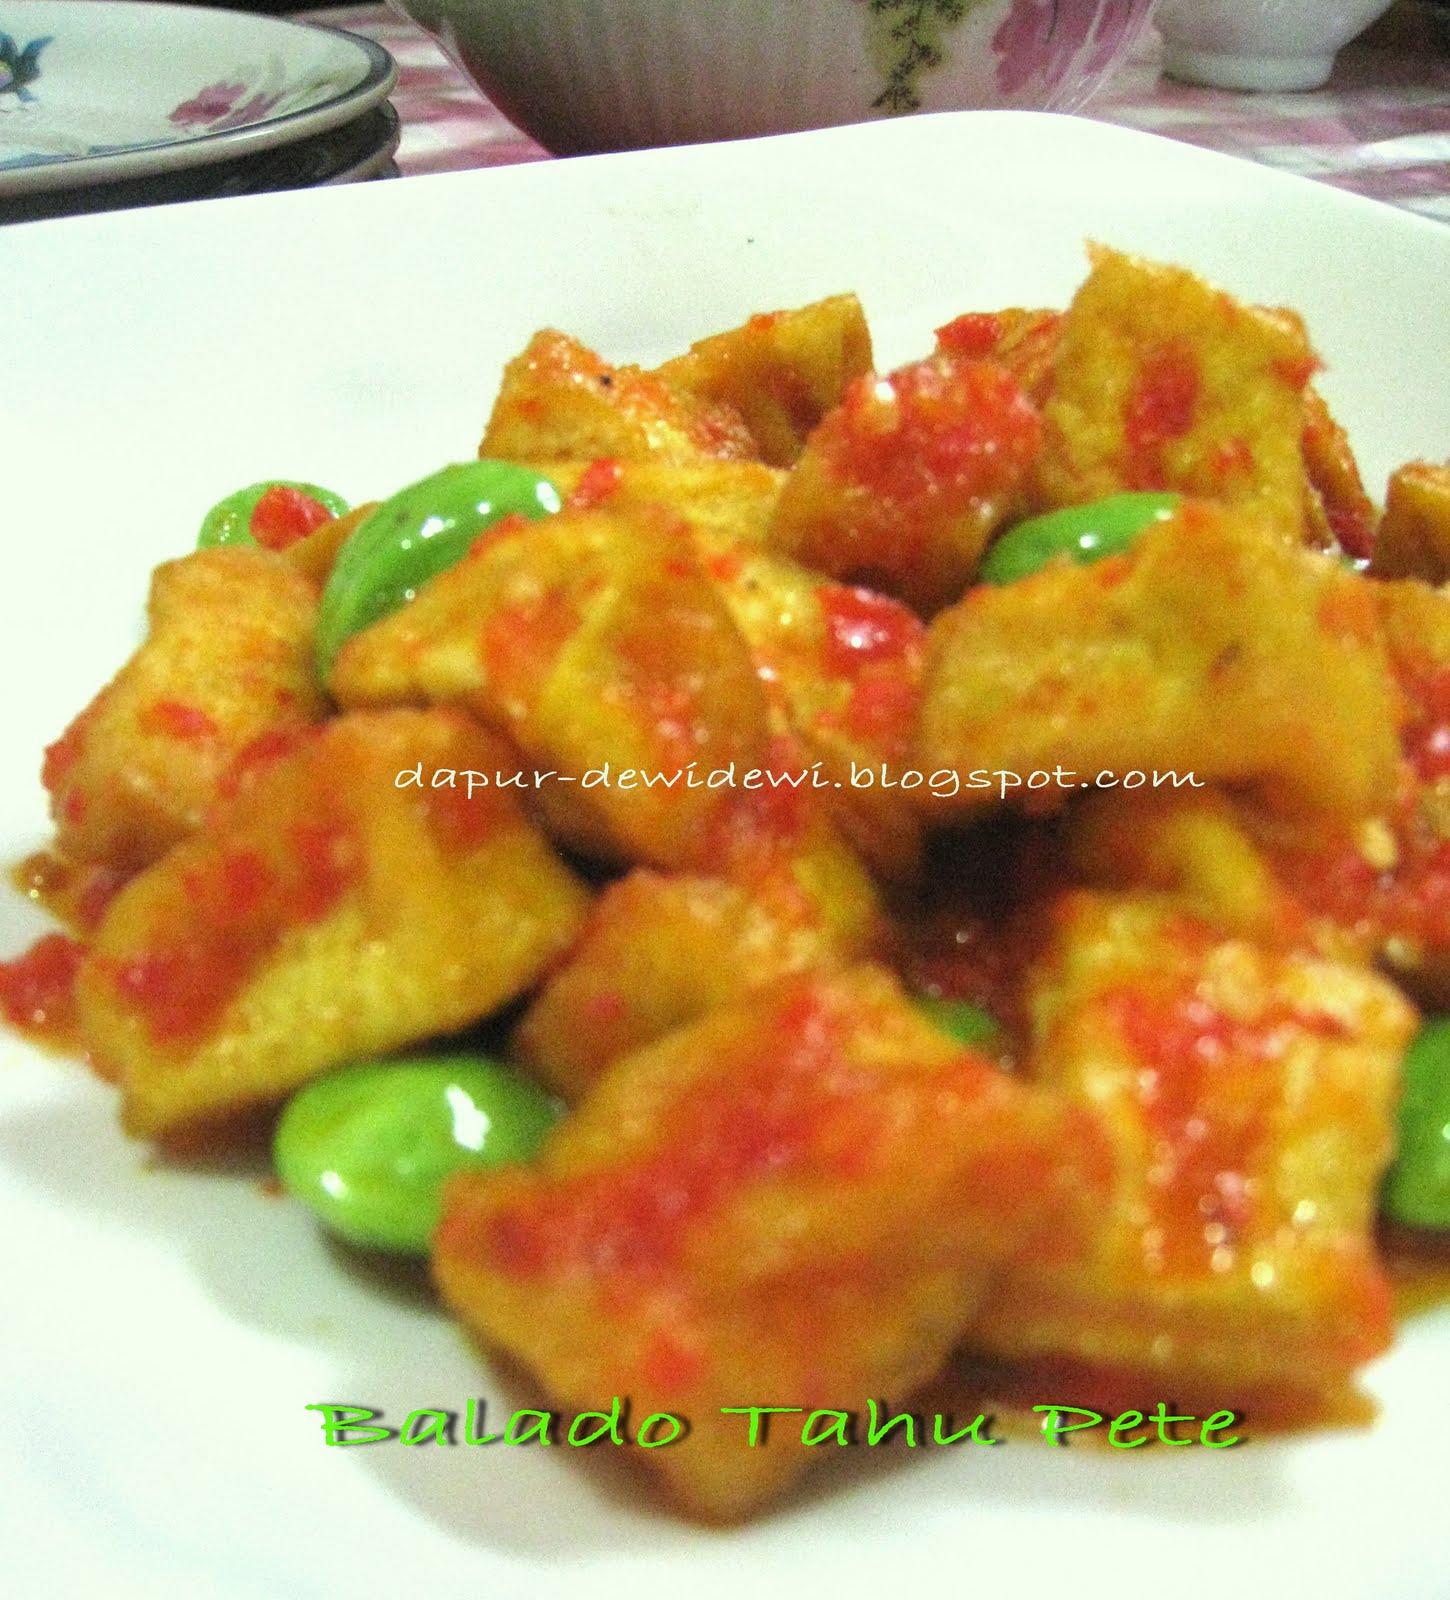 Dapur Kreasiku Nugget Tahu: Dewi@kitchen: Balado Tahu Pete